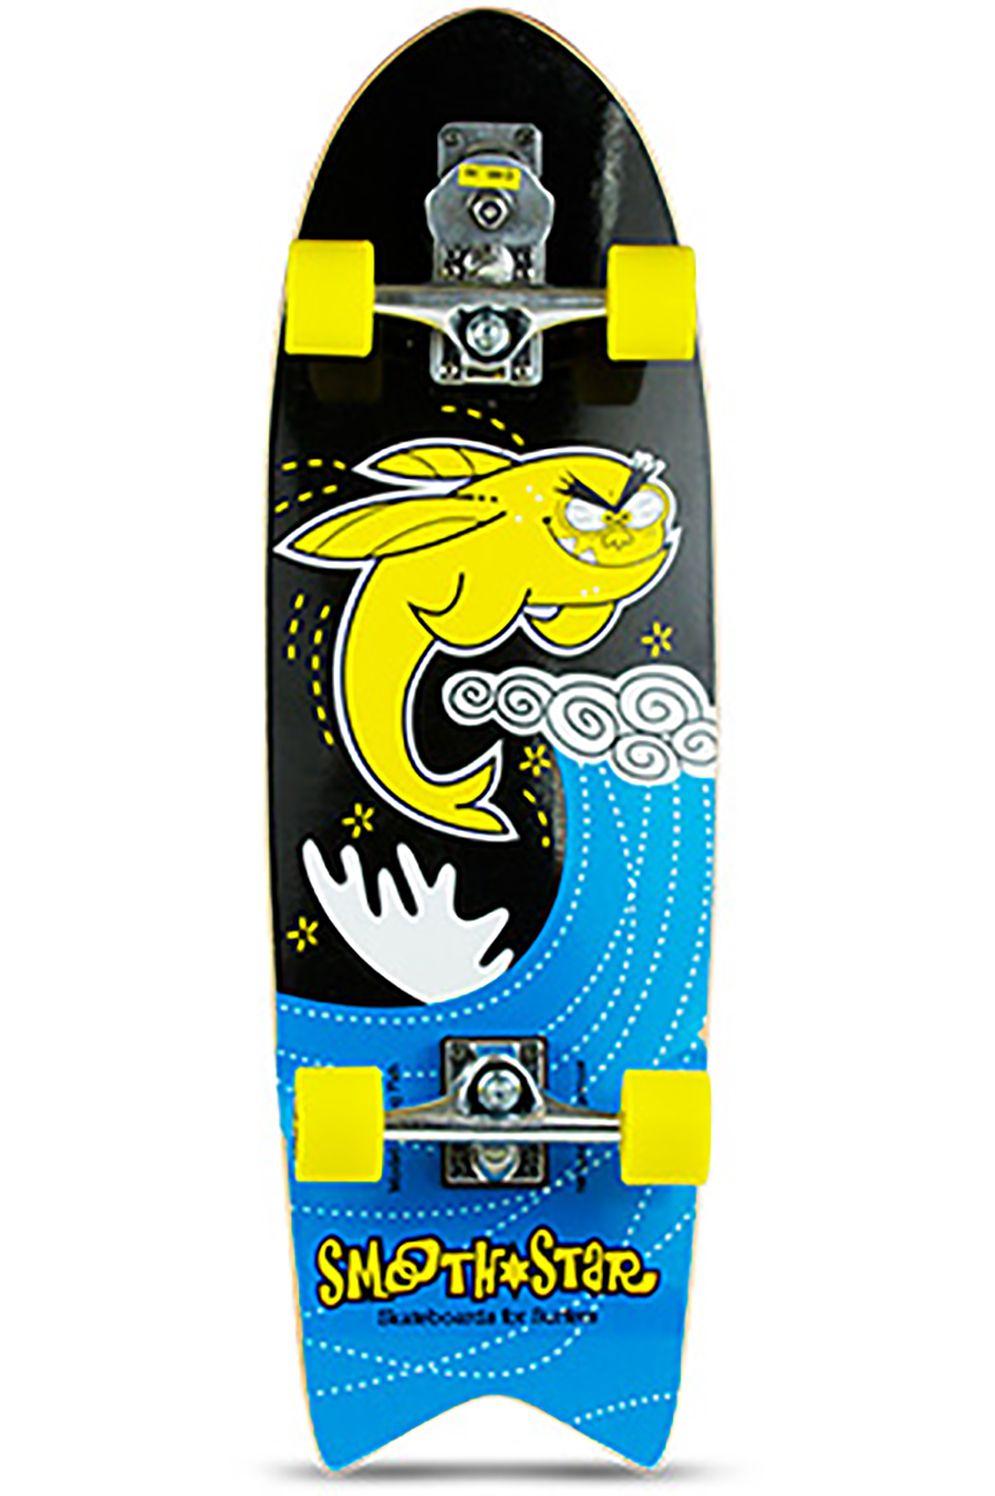 "Smoothstar Surf Skate 32"" FLYING FISH Yellow/Black"